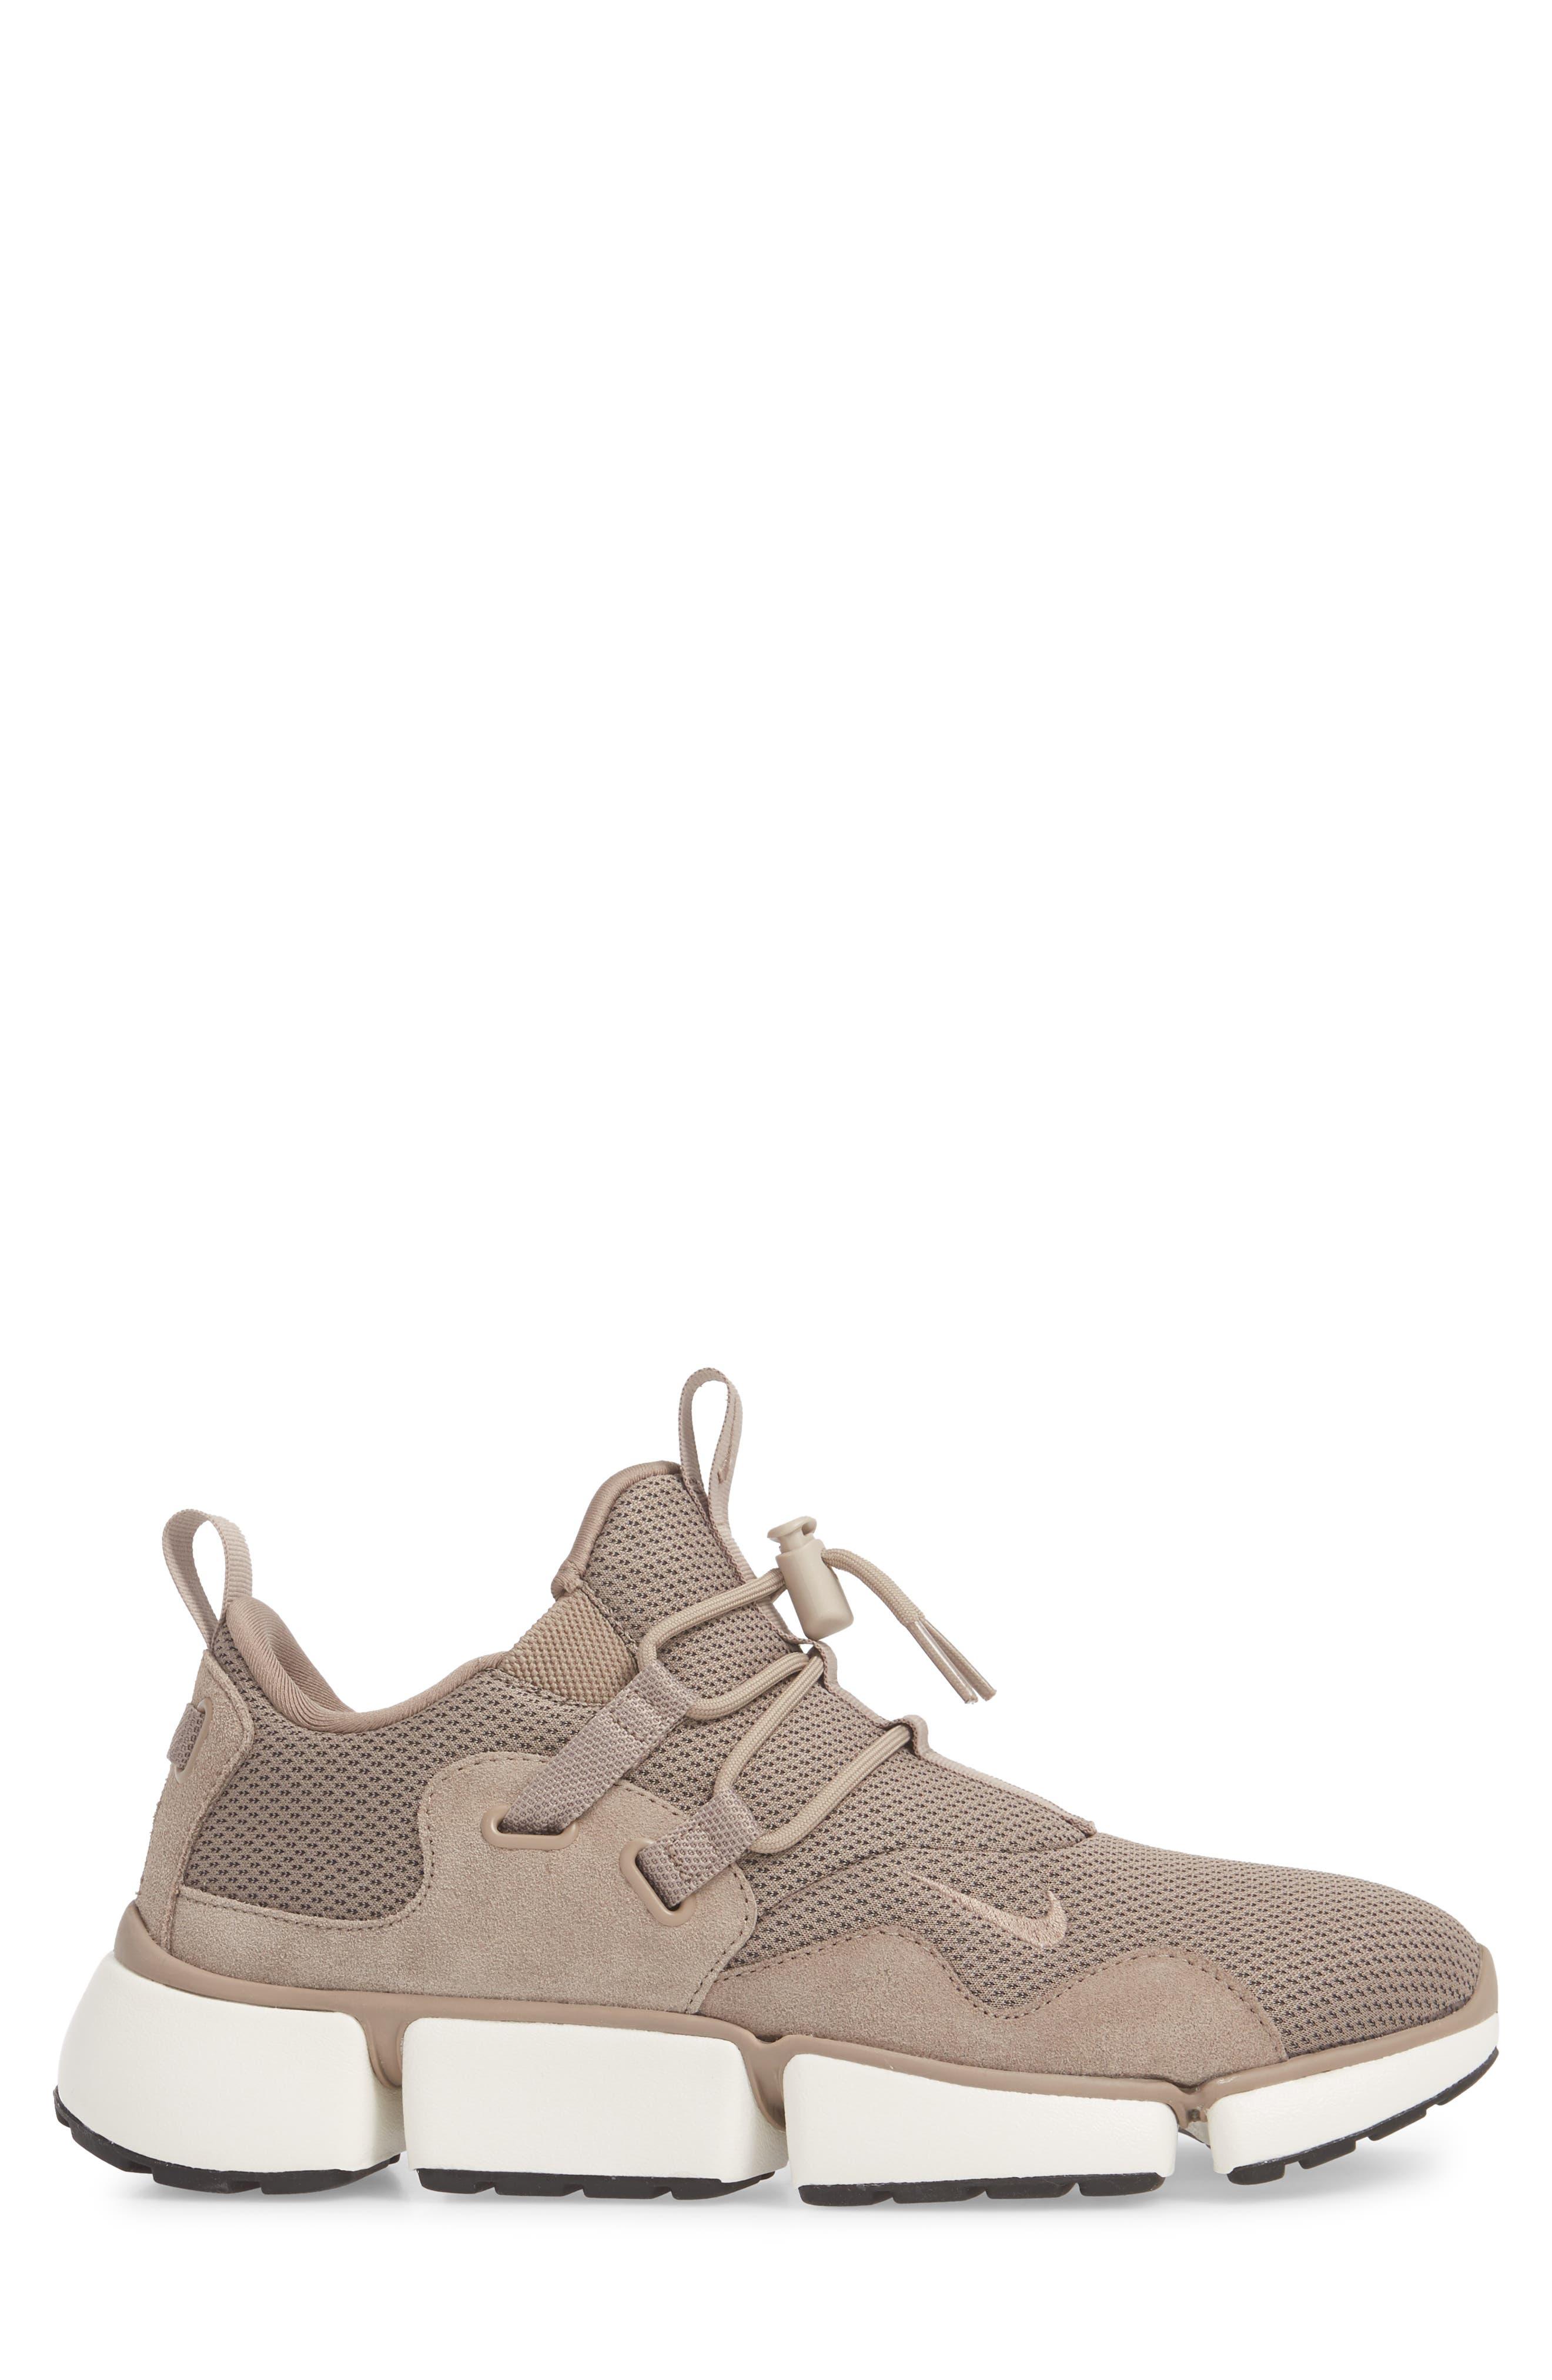 PocketKnife DM SE Sneaker,                             Alternate thumbnail 3, color,                             Sepia Stone/ Sail/ Black